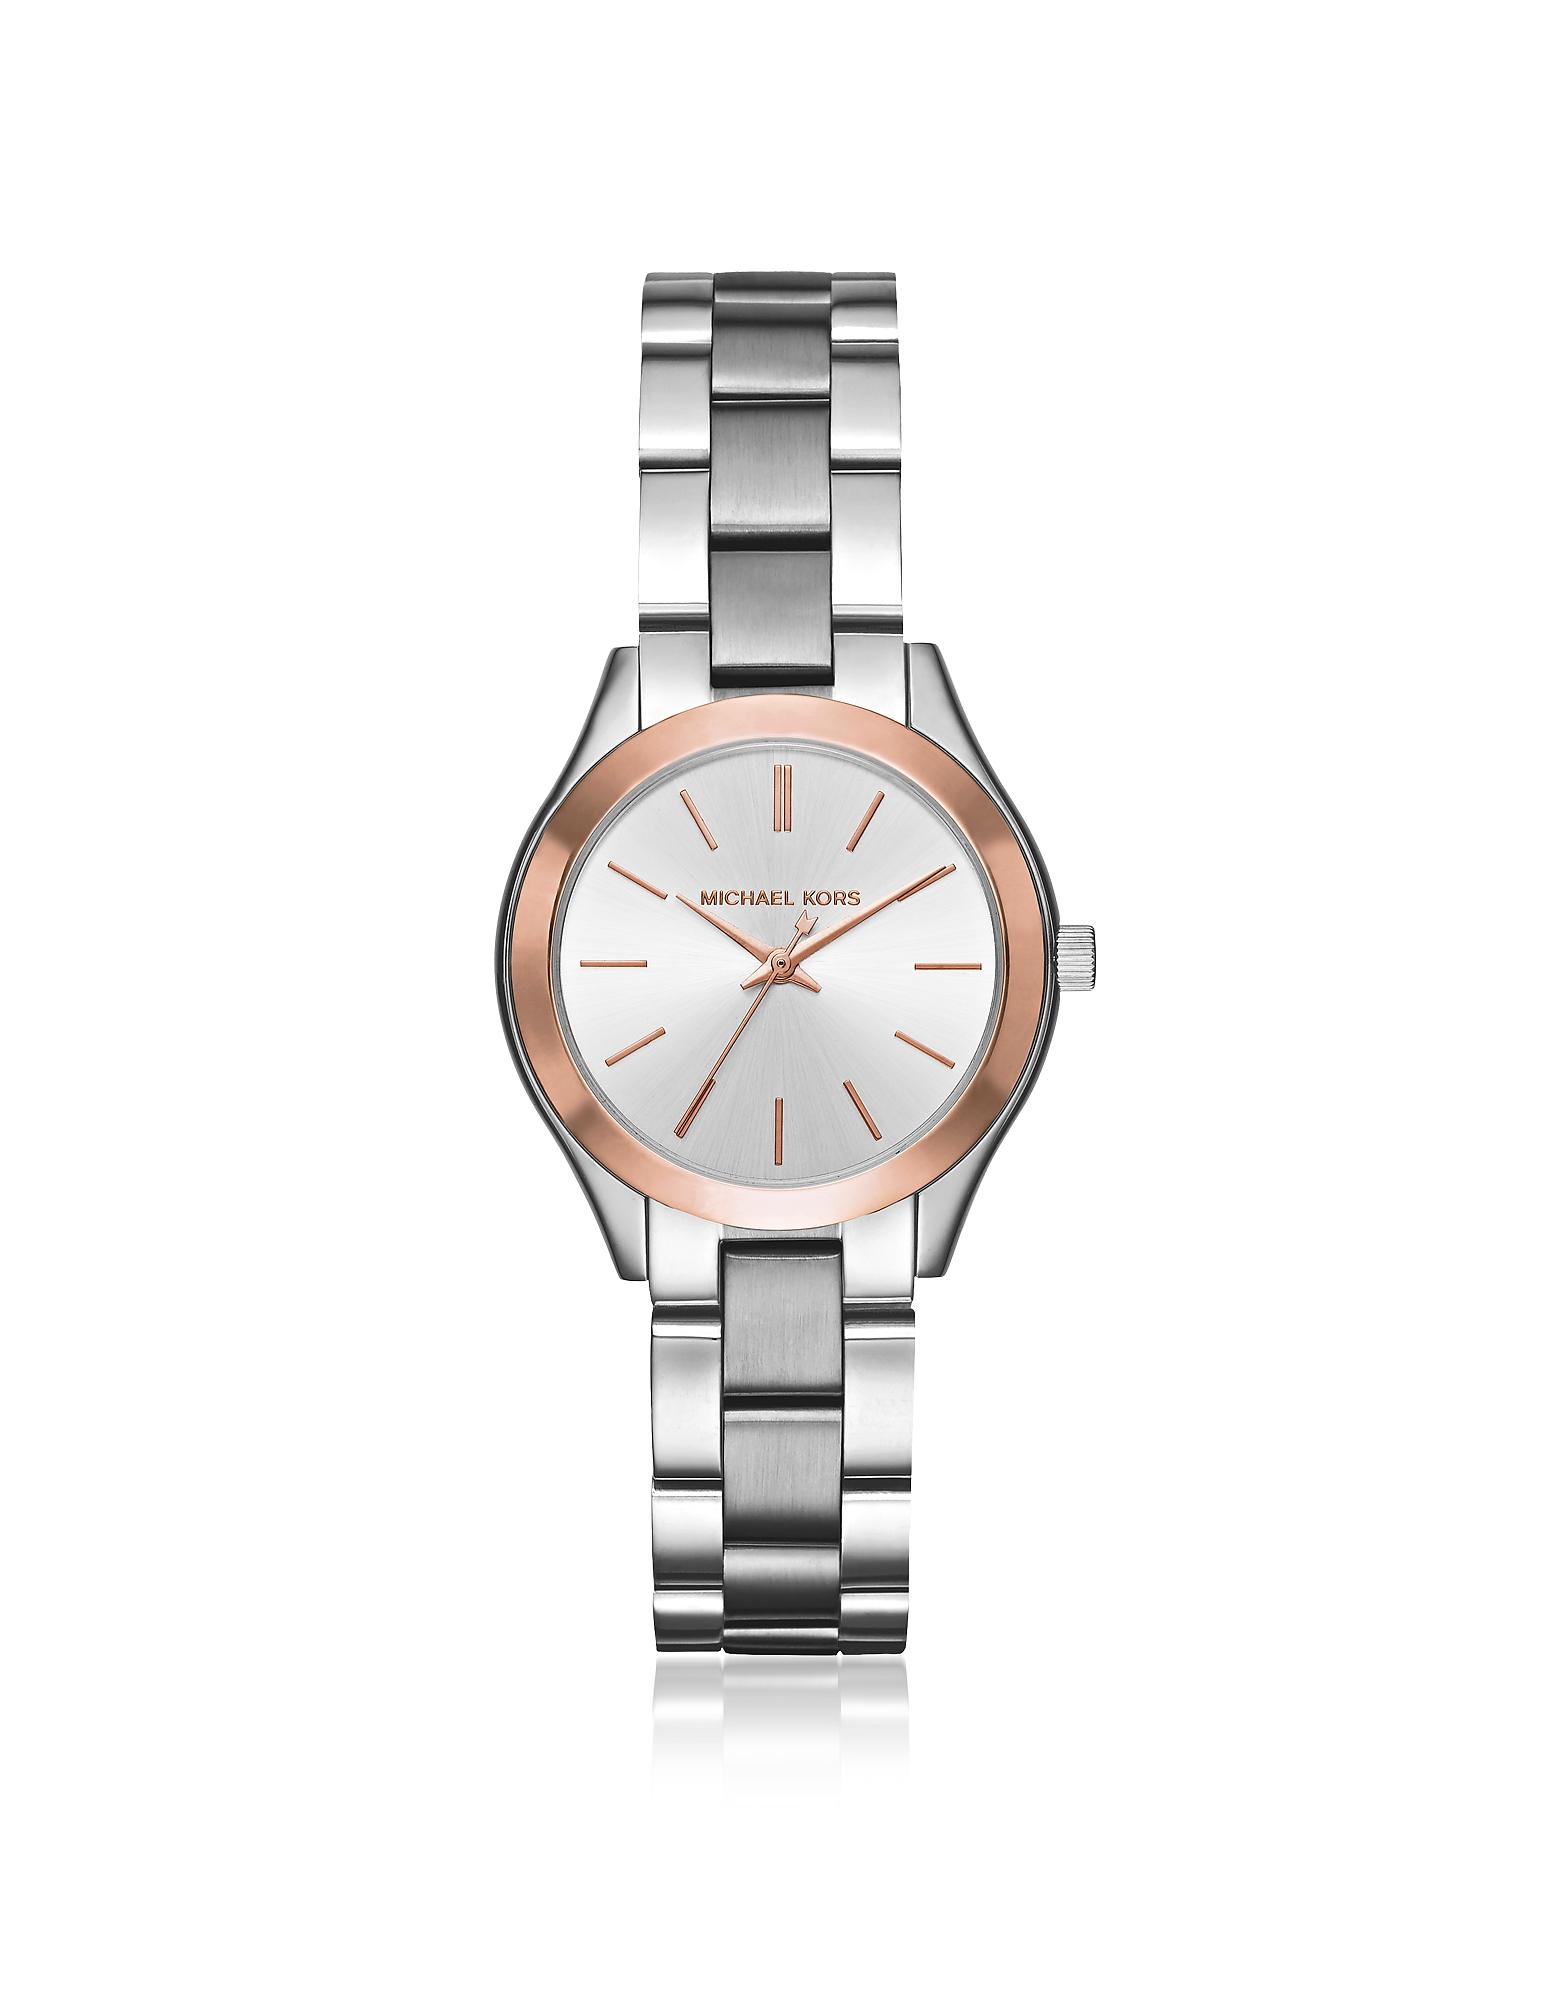 Michael Kors Women's Watches, Mini Slim Runway Two Tone Women's Watch